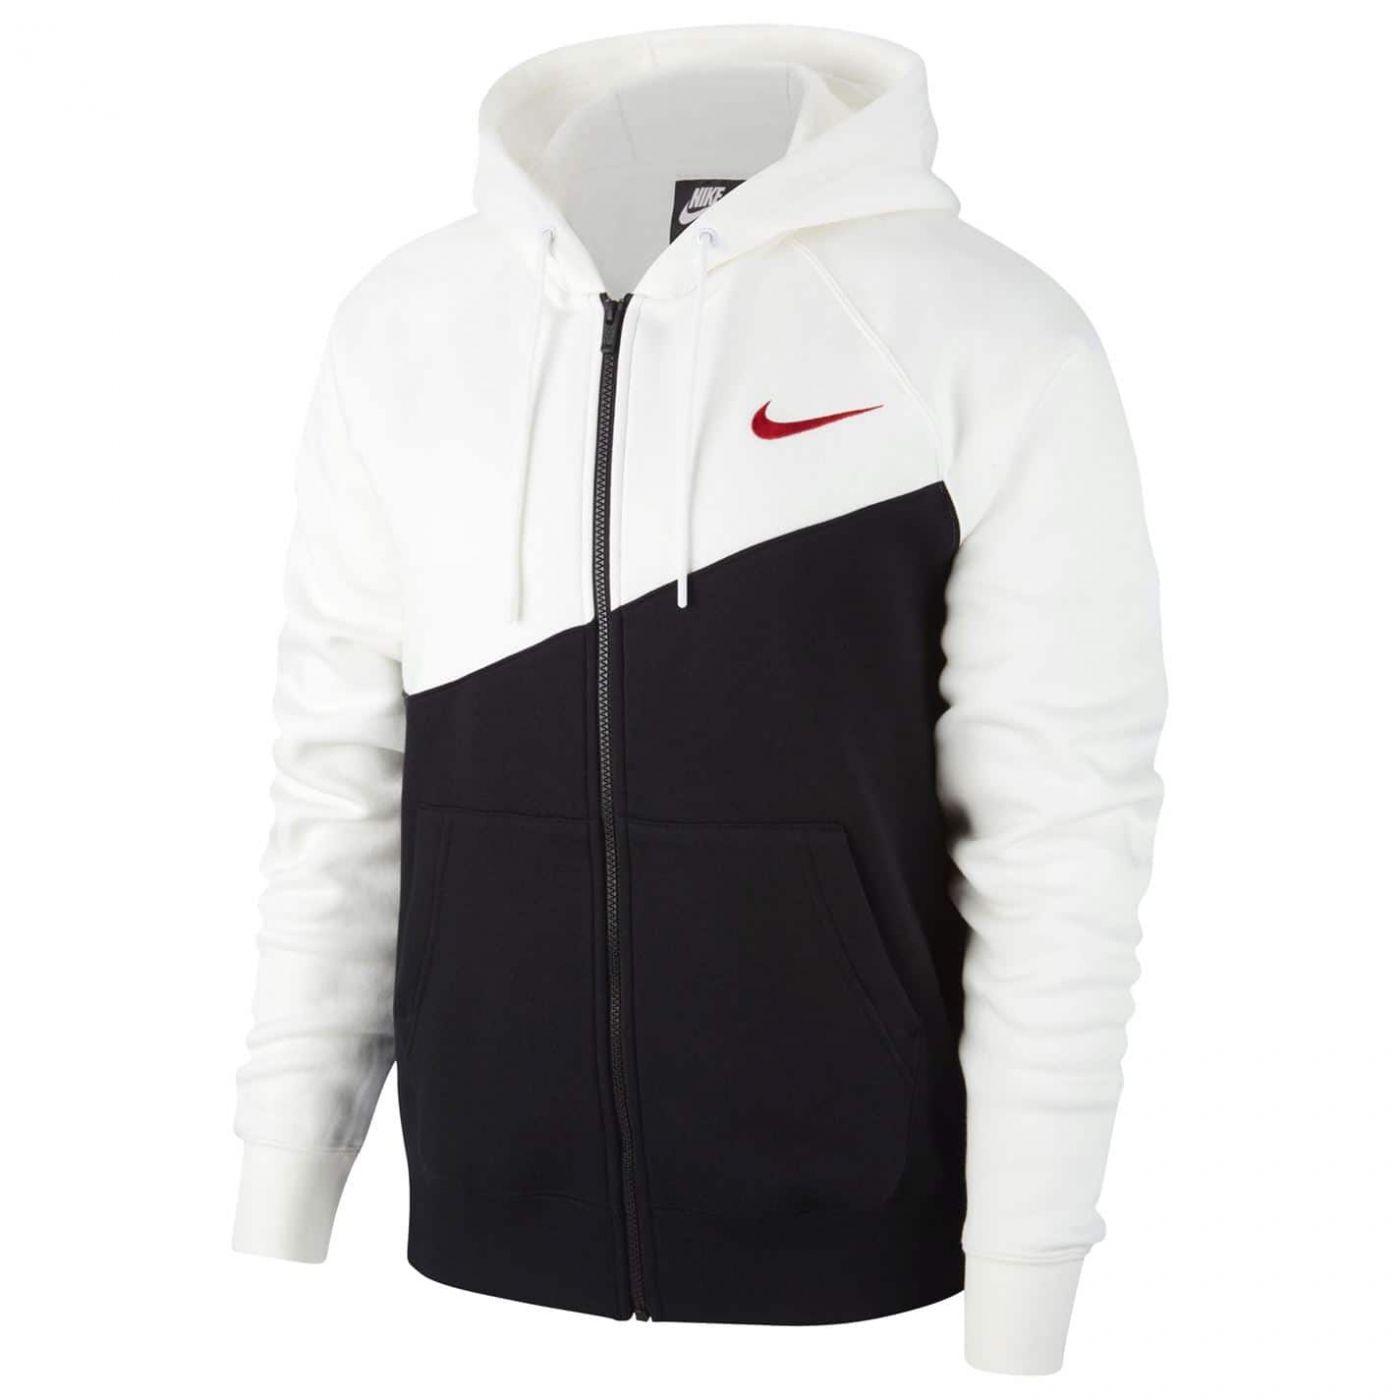 Nike HBR SwooshHoodSn94